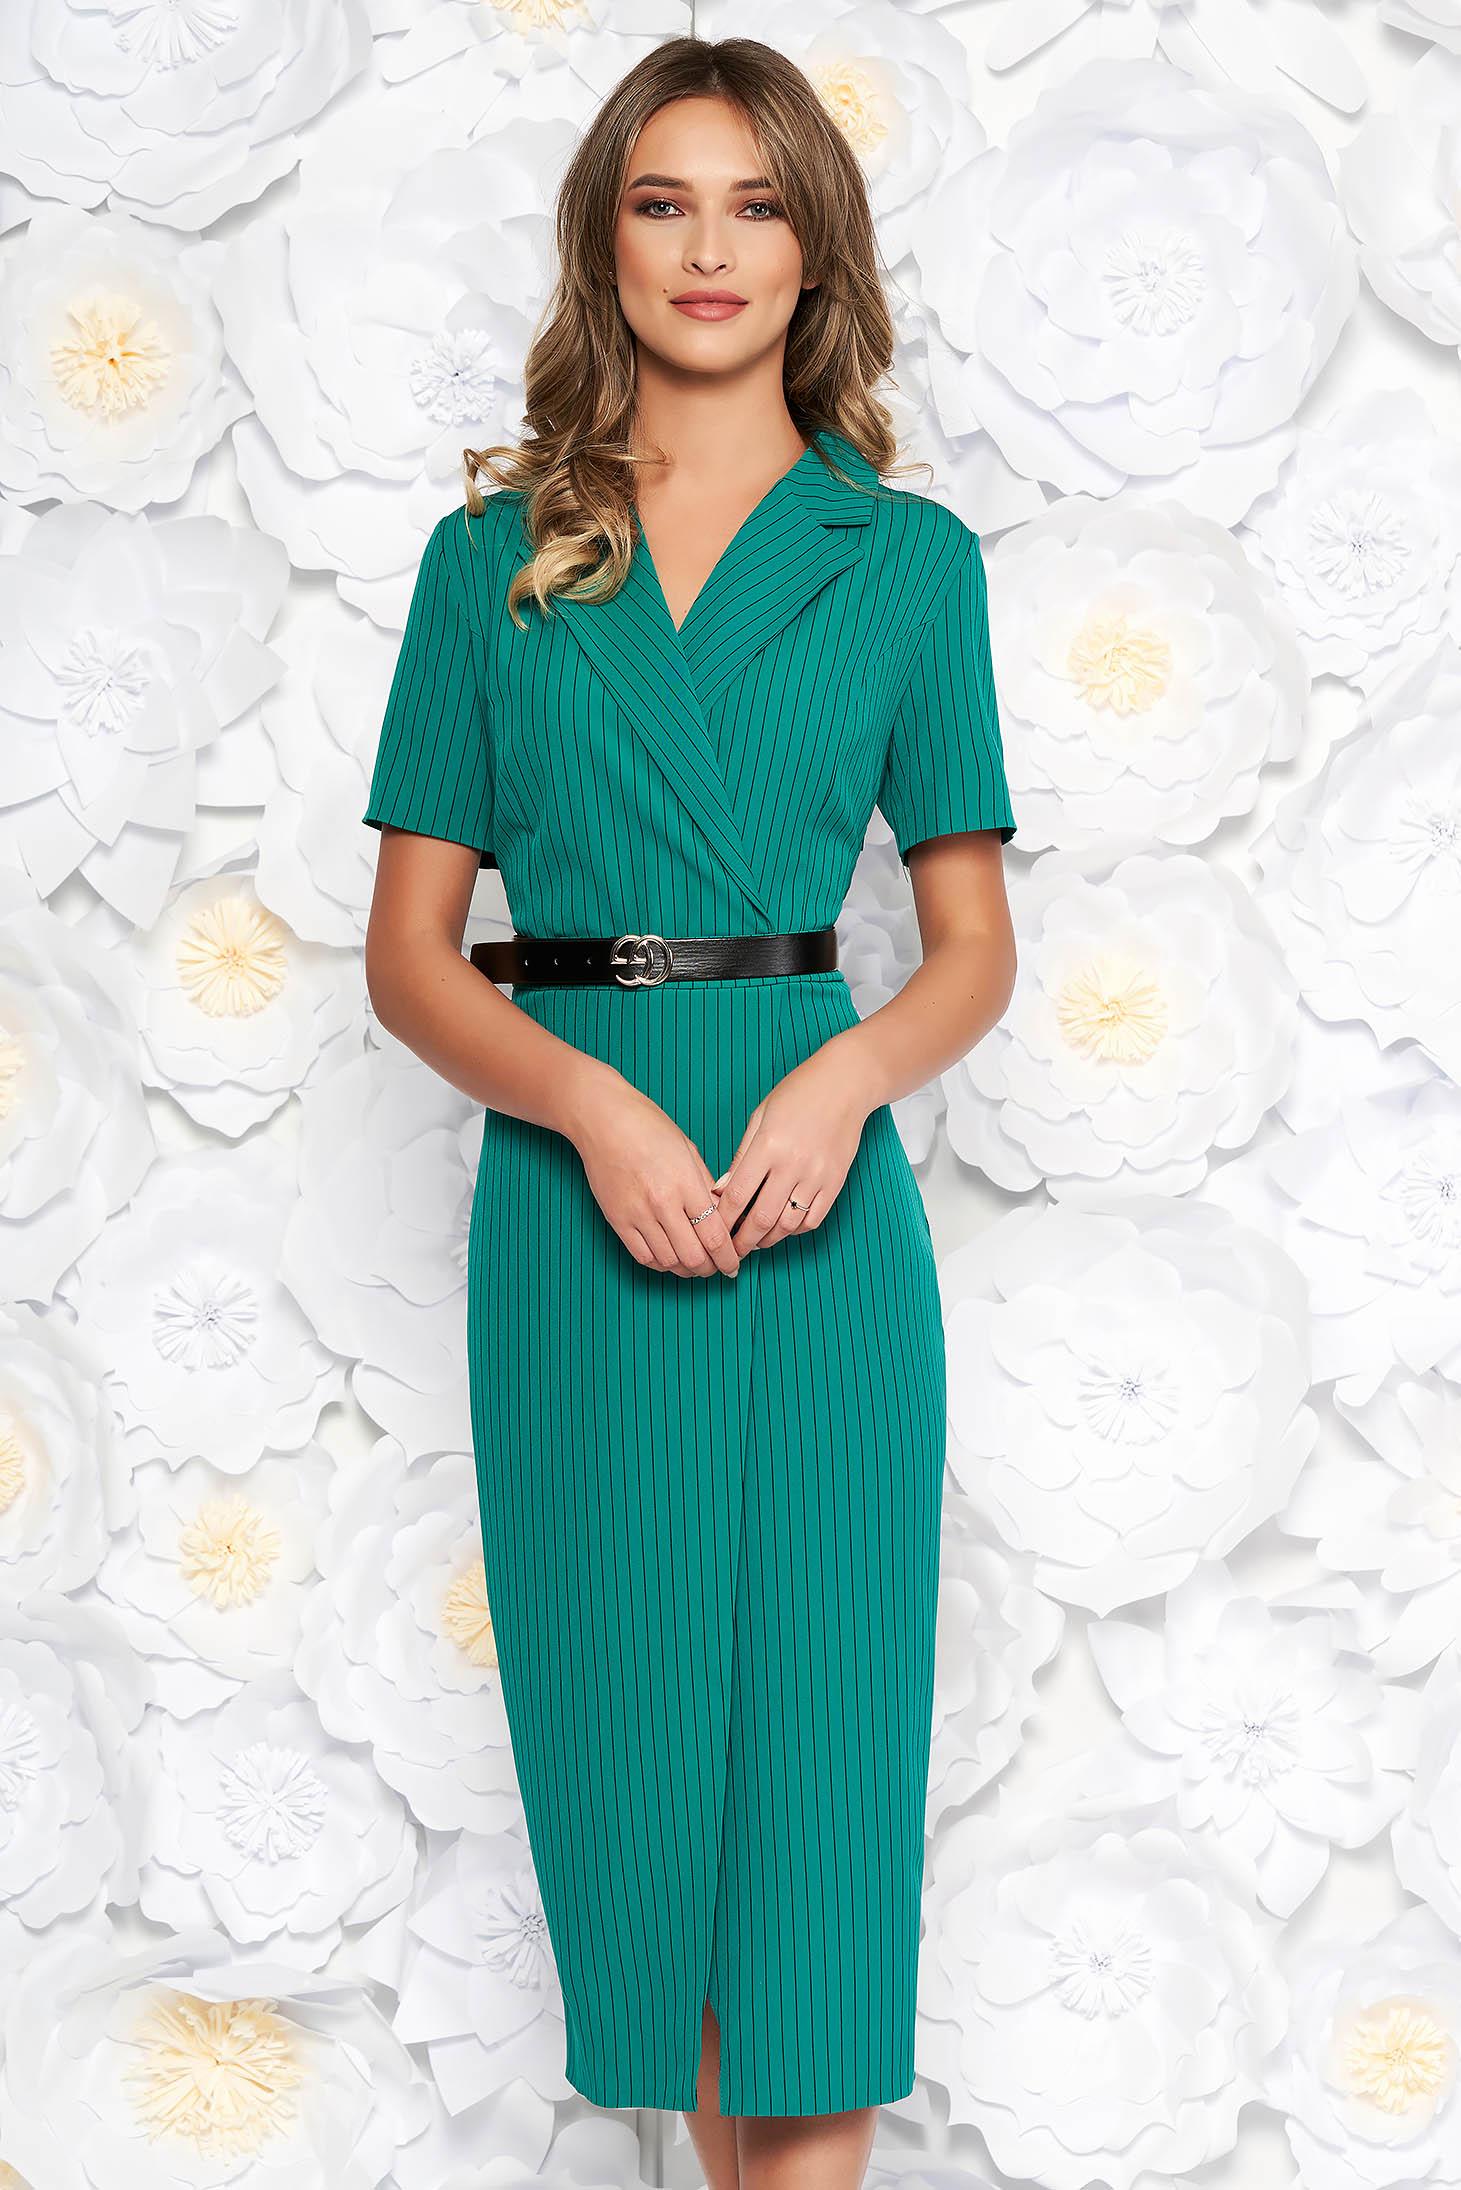 Rochie verde de zi midi cu un croi mulat din stofa subtire usor elastica cu accesoriu tip curea